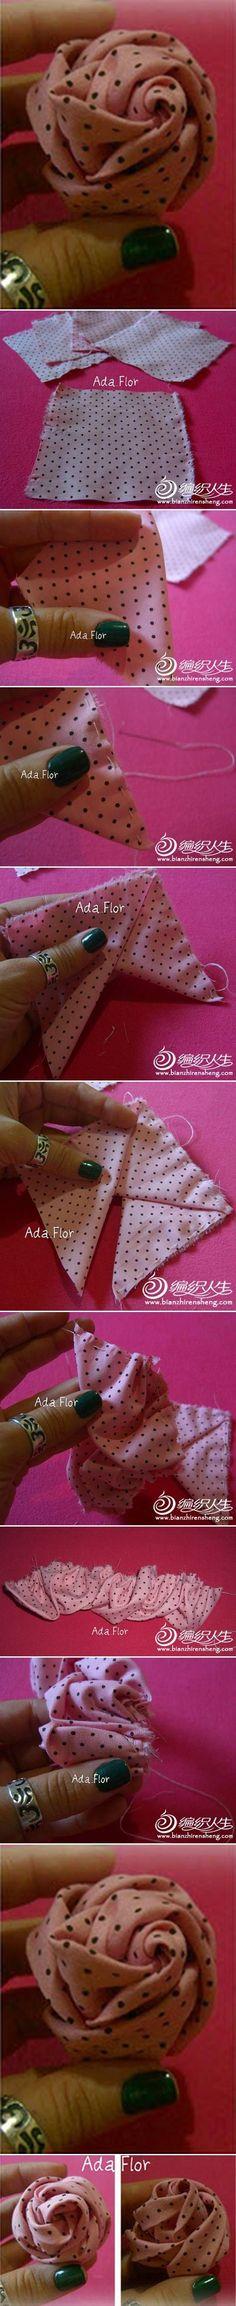 DIY Modular Fabric Rose DIY Projects....reépinglé par Maurie Daboux .•*`*•. ❥